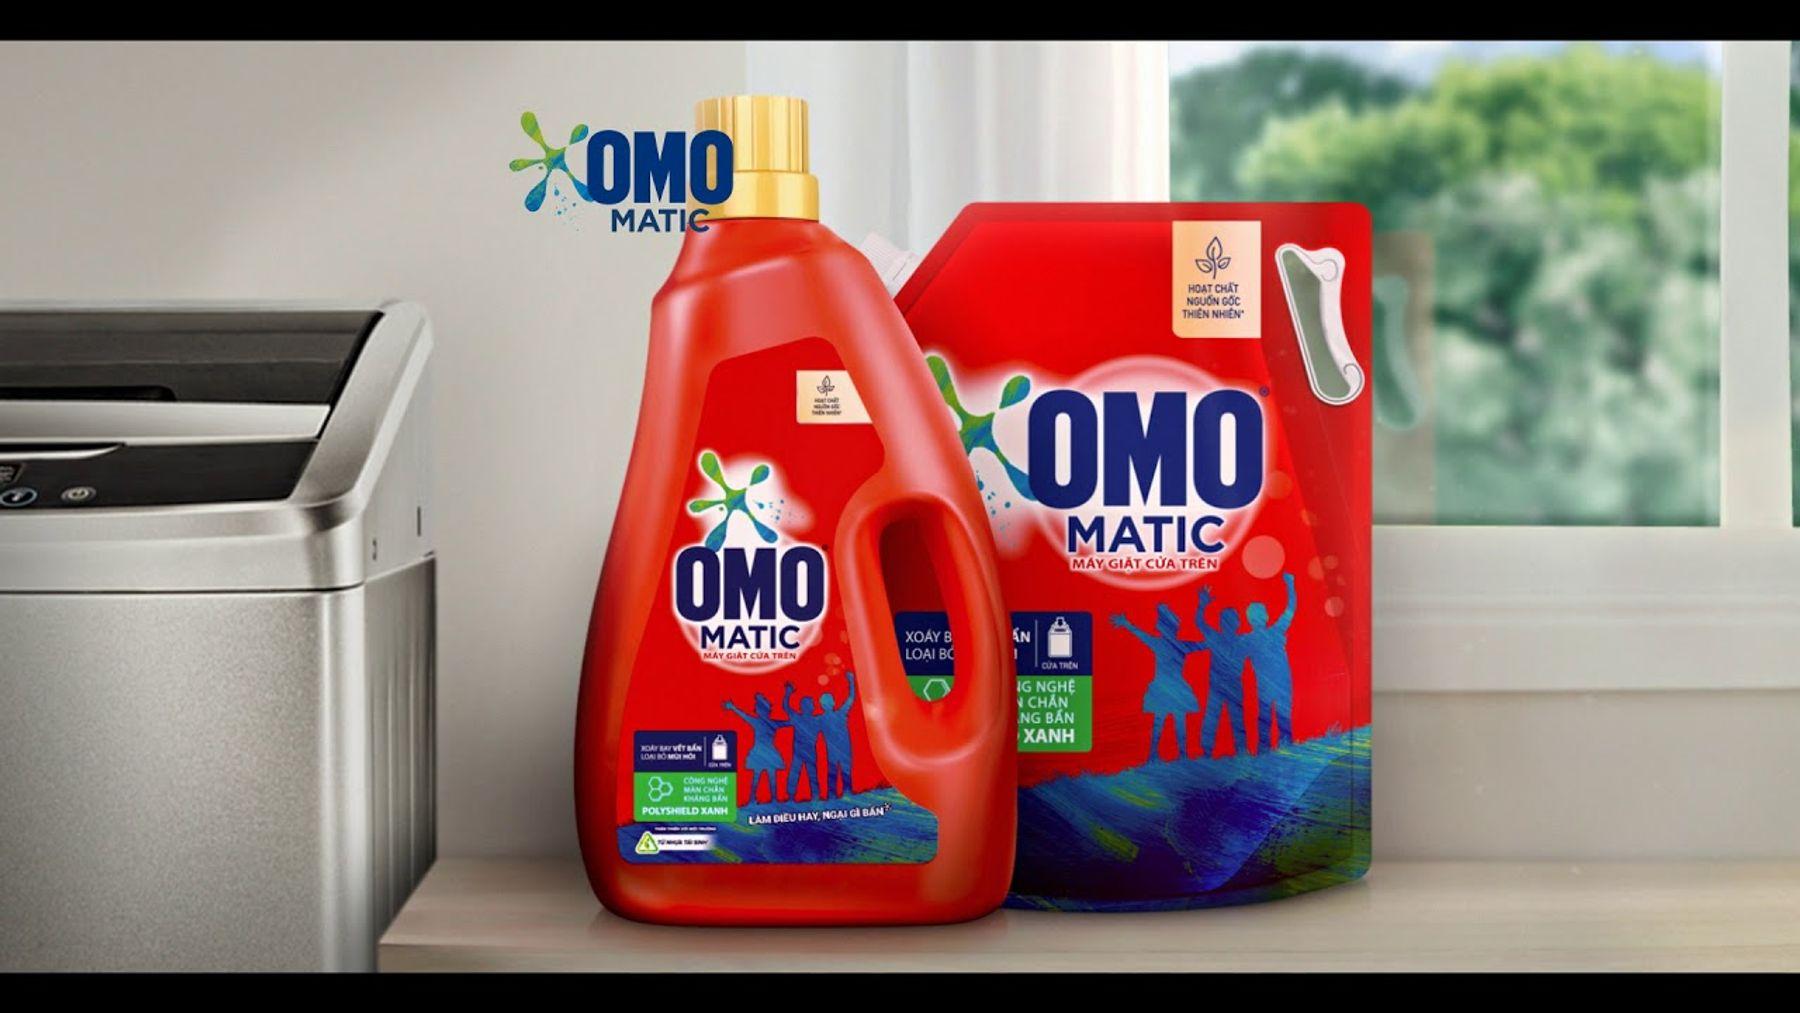 Nước giặt Omo Matic 2 trong 1